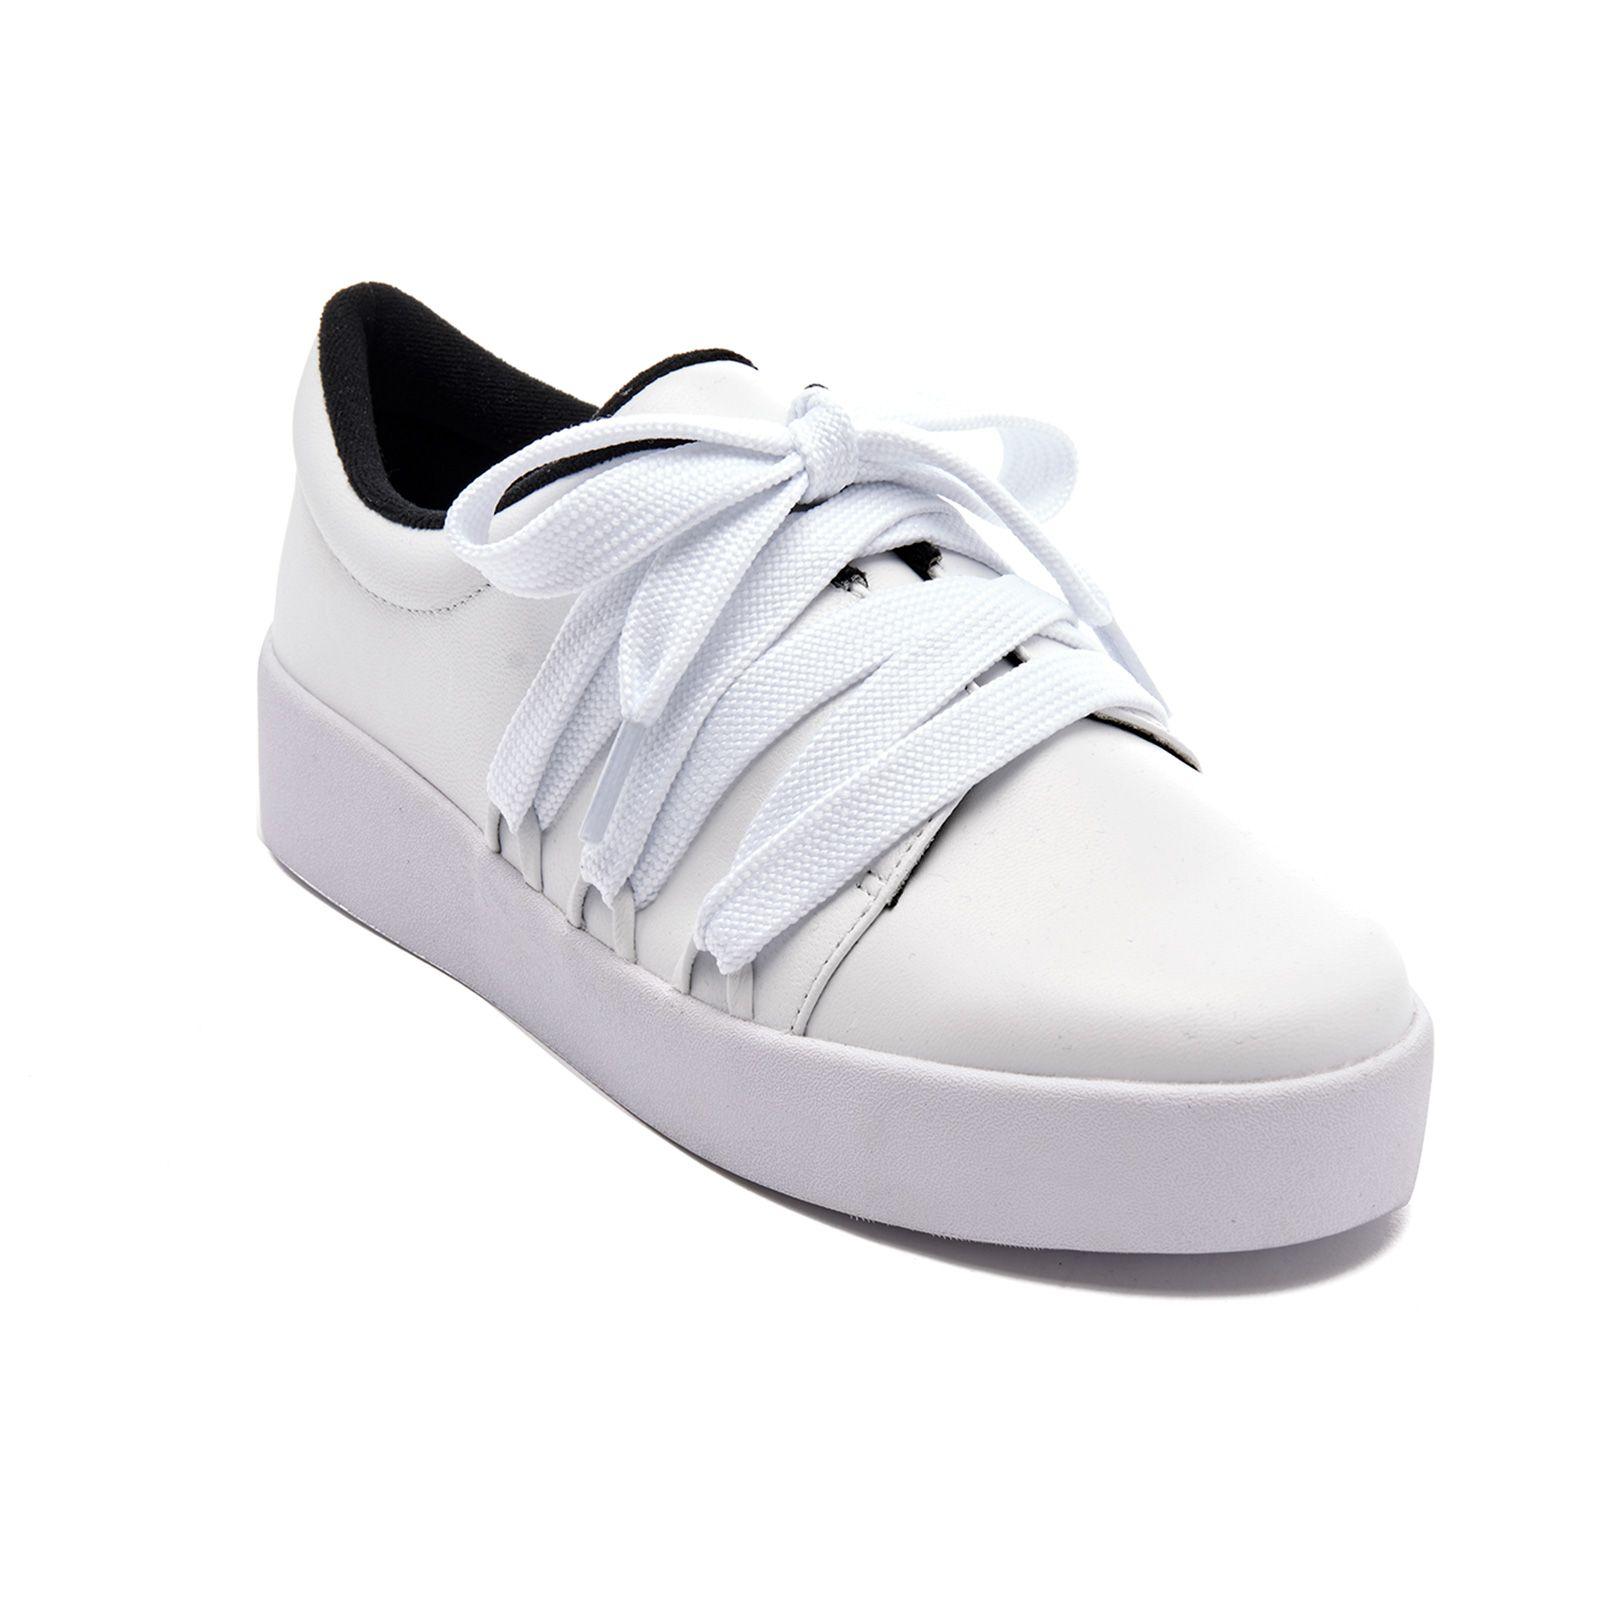 FOOTWEAR - Low-tops & sneakers Senso 2VTWMctR